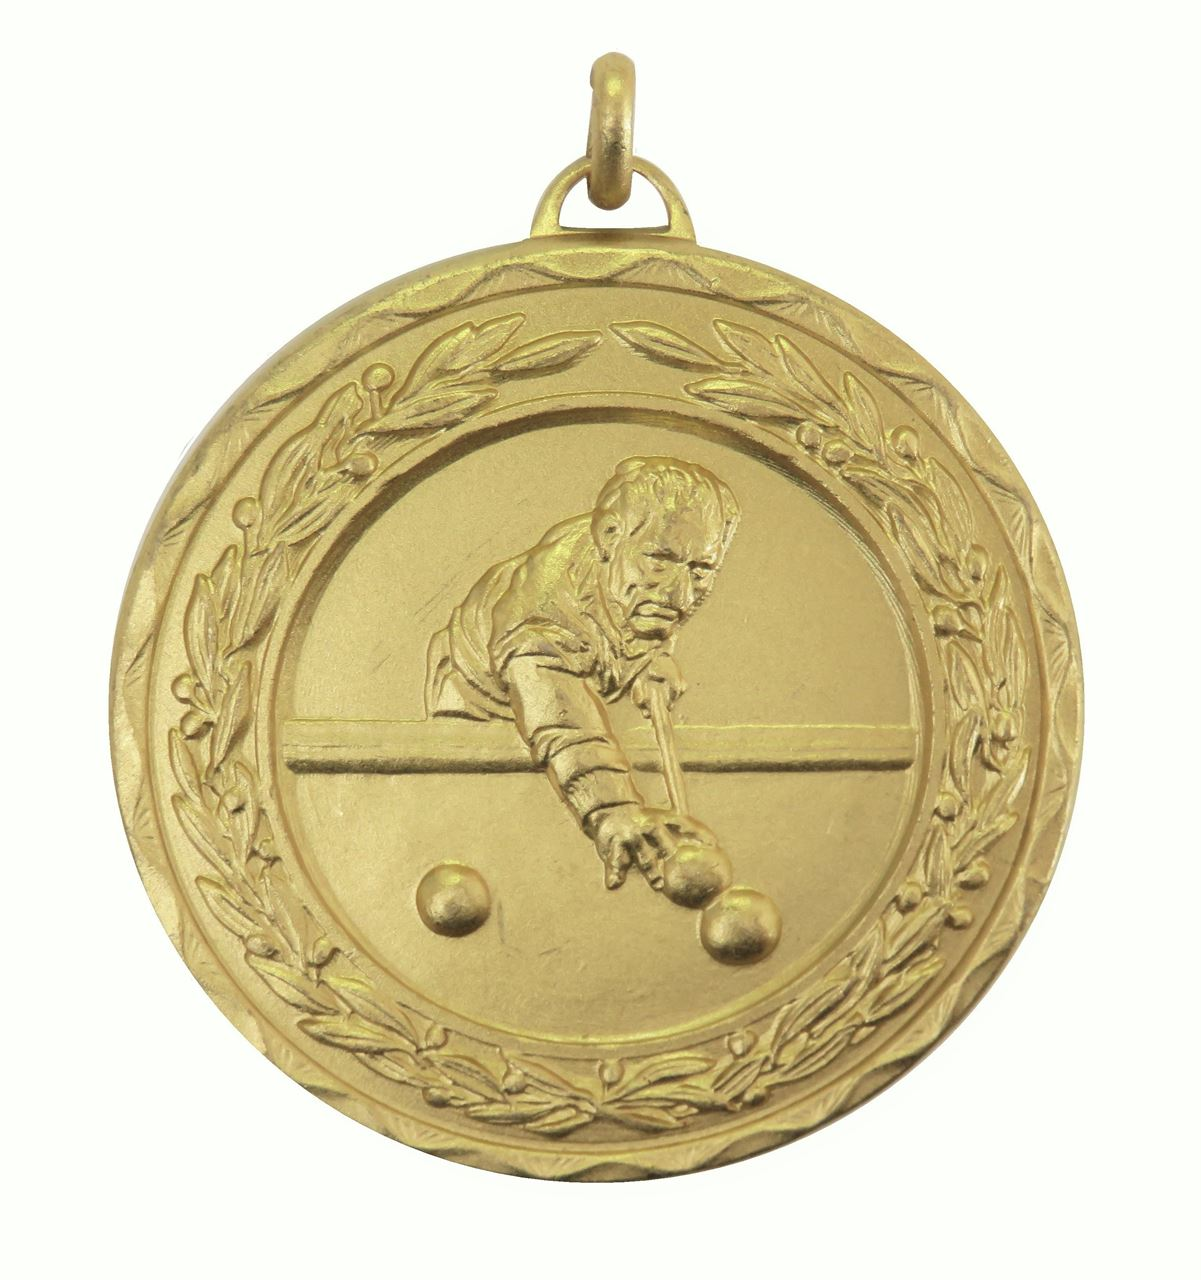 Gold Laurel Economy Snooker / Pool Medal (size: 50mm) - 4015E